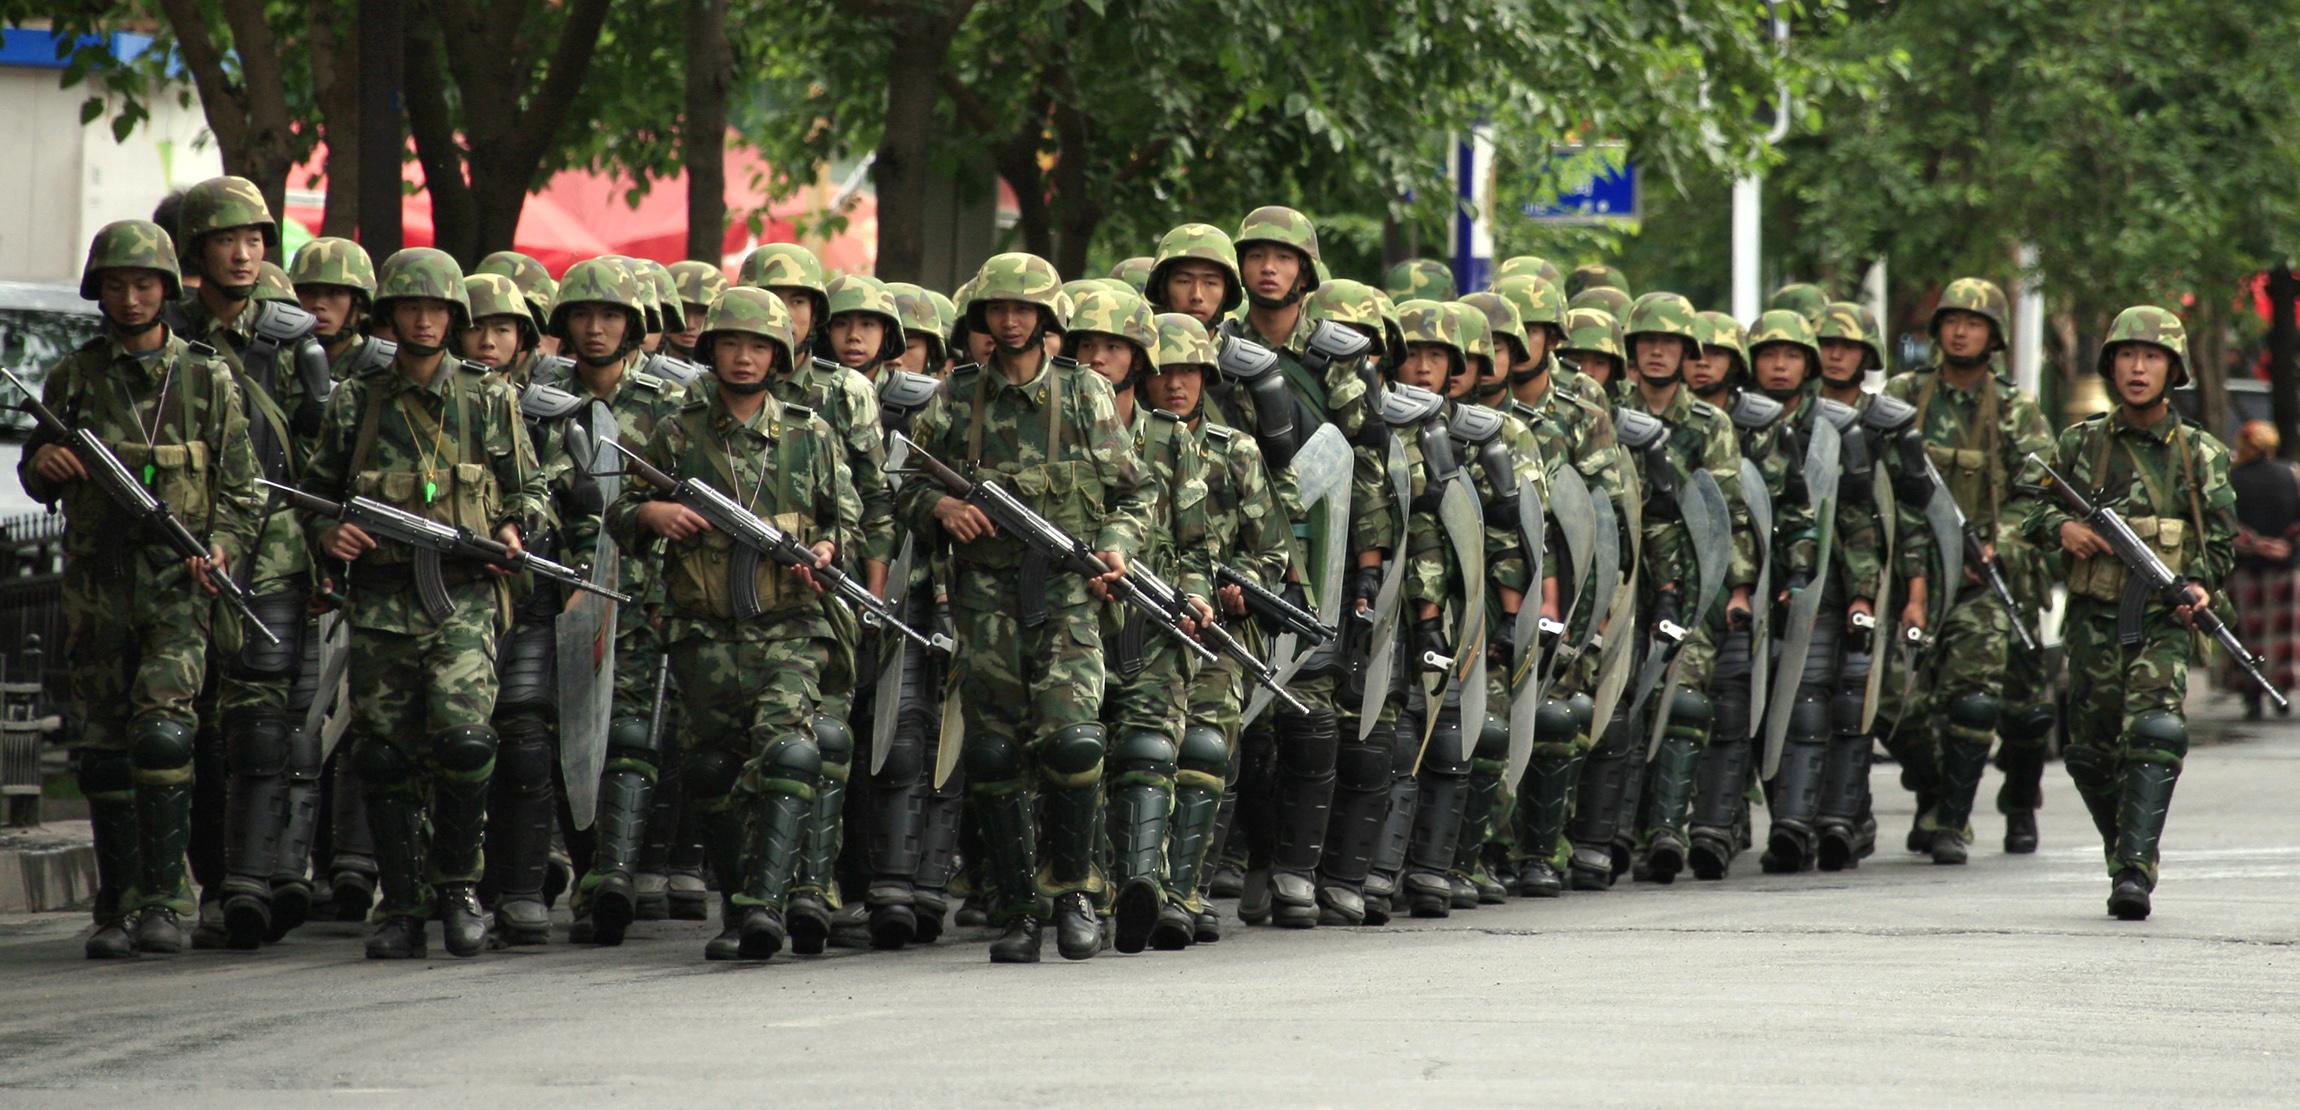 Armed Chinese paramilitary police in riot gear march along main near Dong Kuruk Bridge mosque in Urumqi in China's Xinjiang Autonomous Region